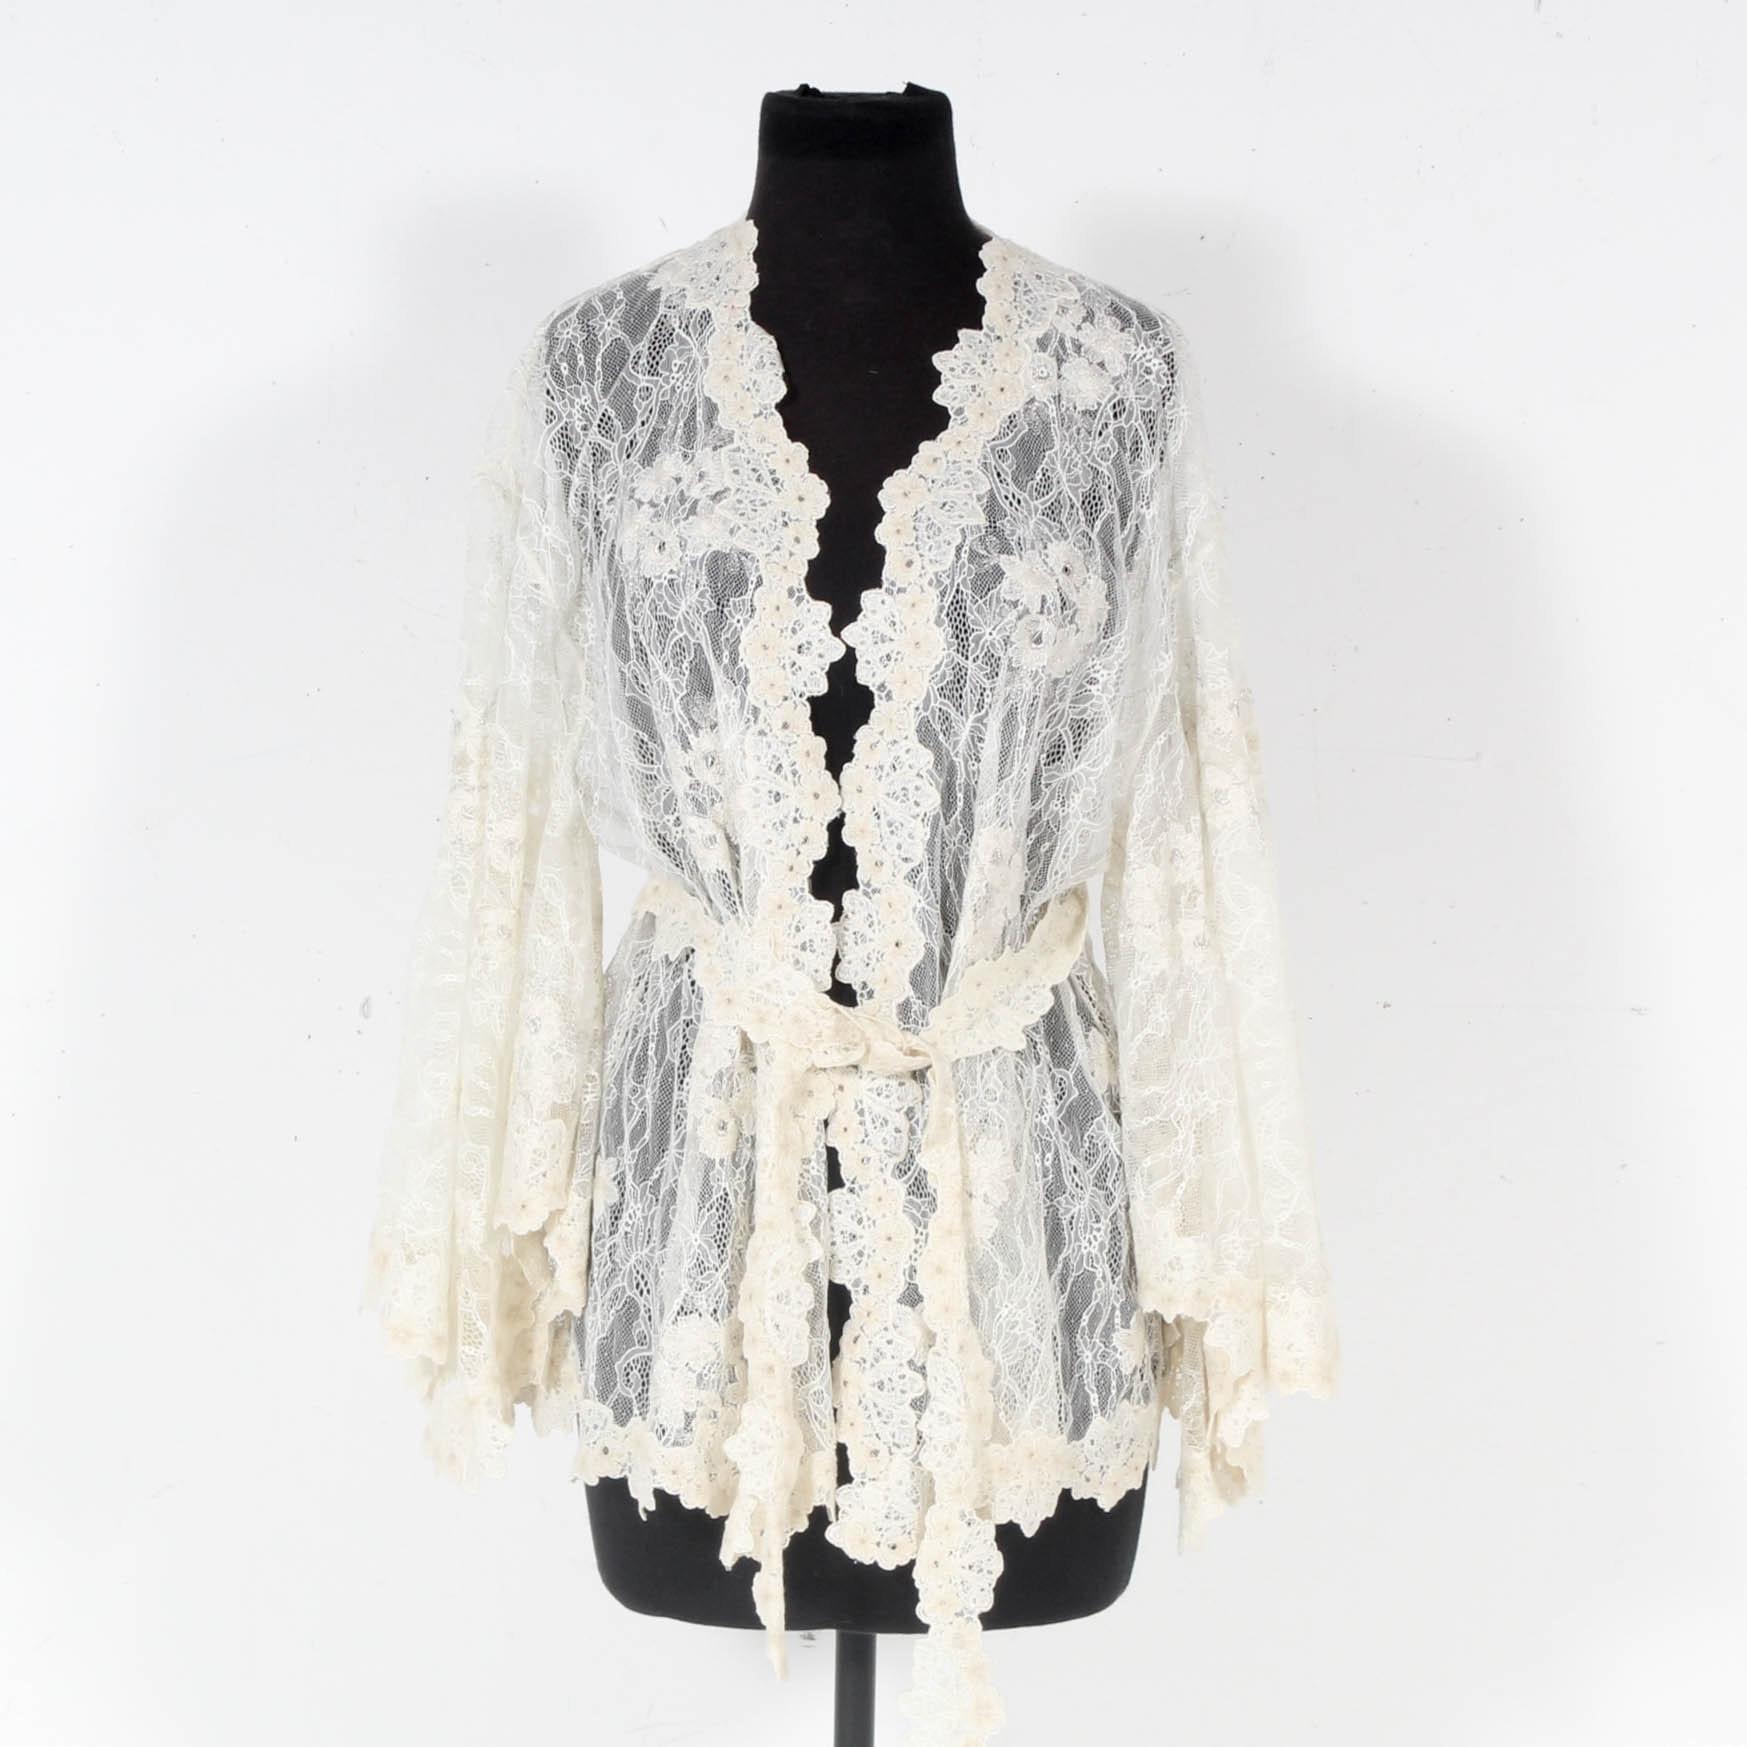 Josie Natori Ivory Lace Belted Jacket